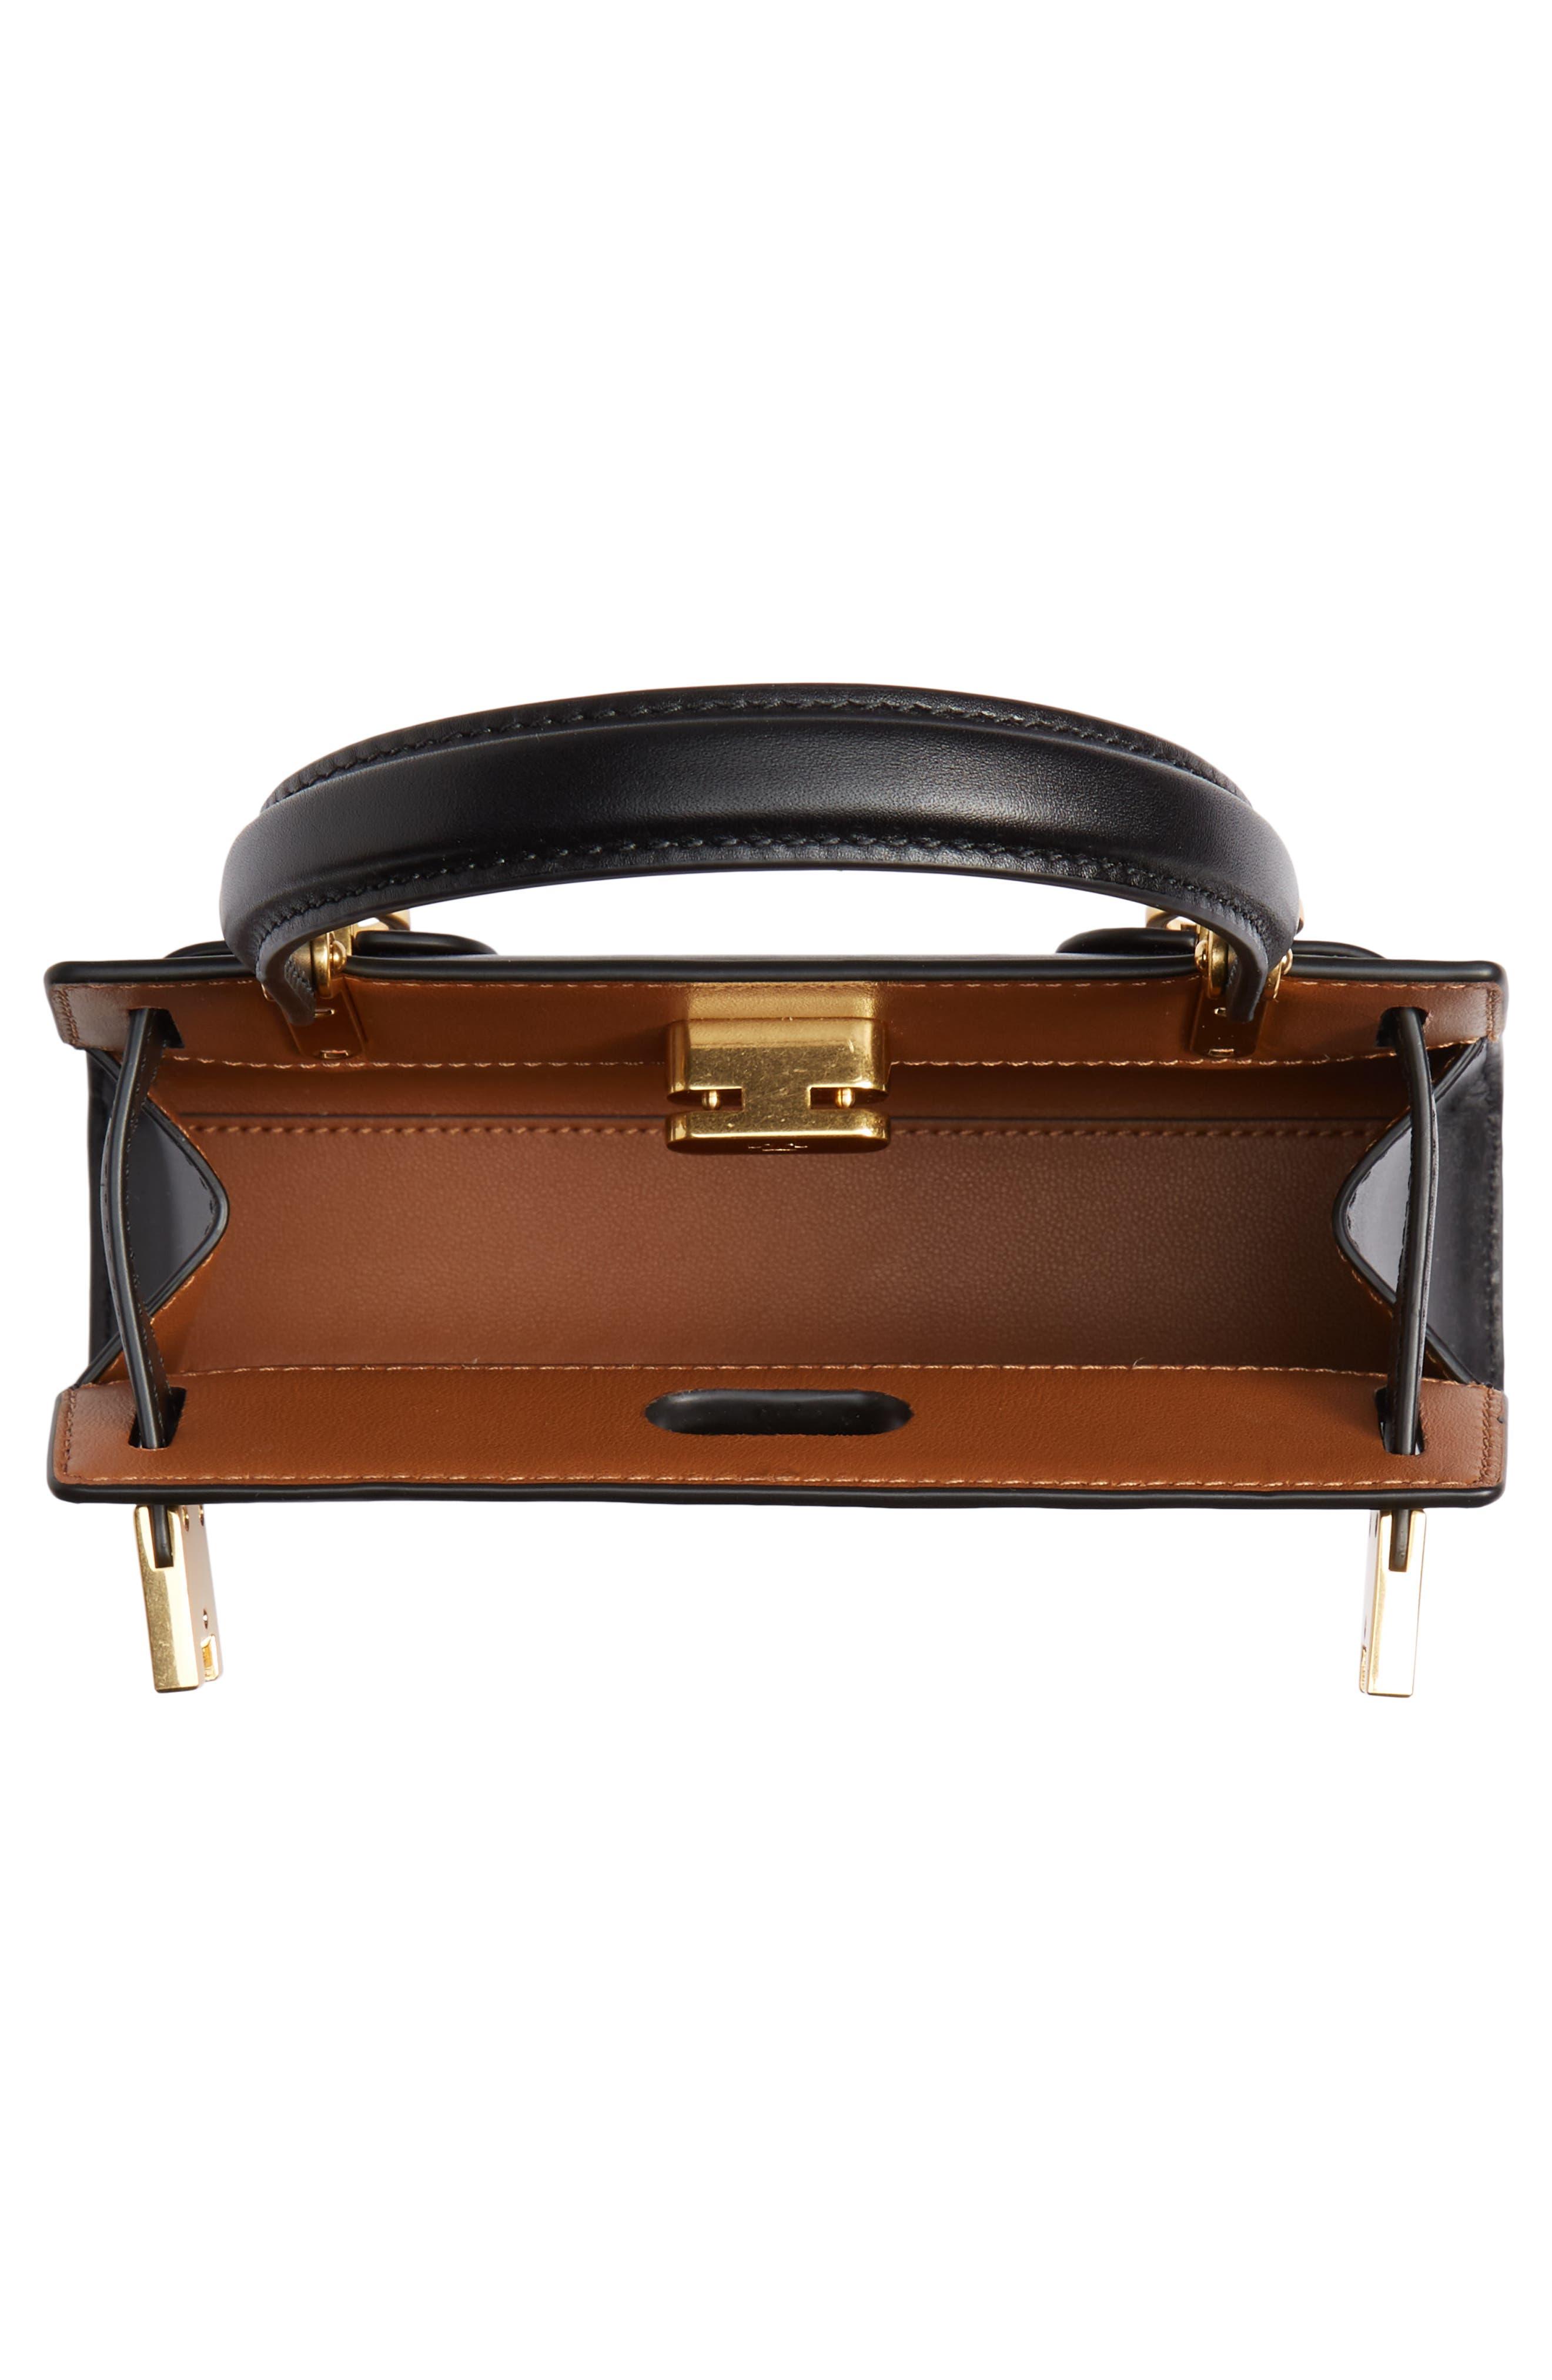 TORY BURCH, Mini Lee Radziwill Leather Bag, Alternate thumbnail 4, color, BLACK